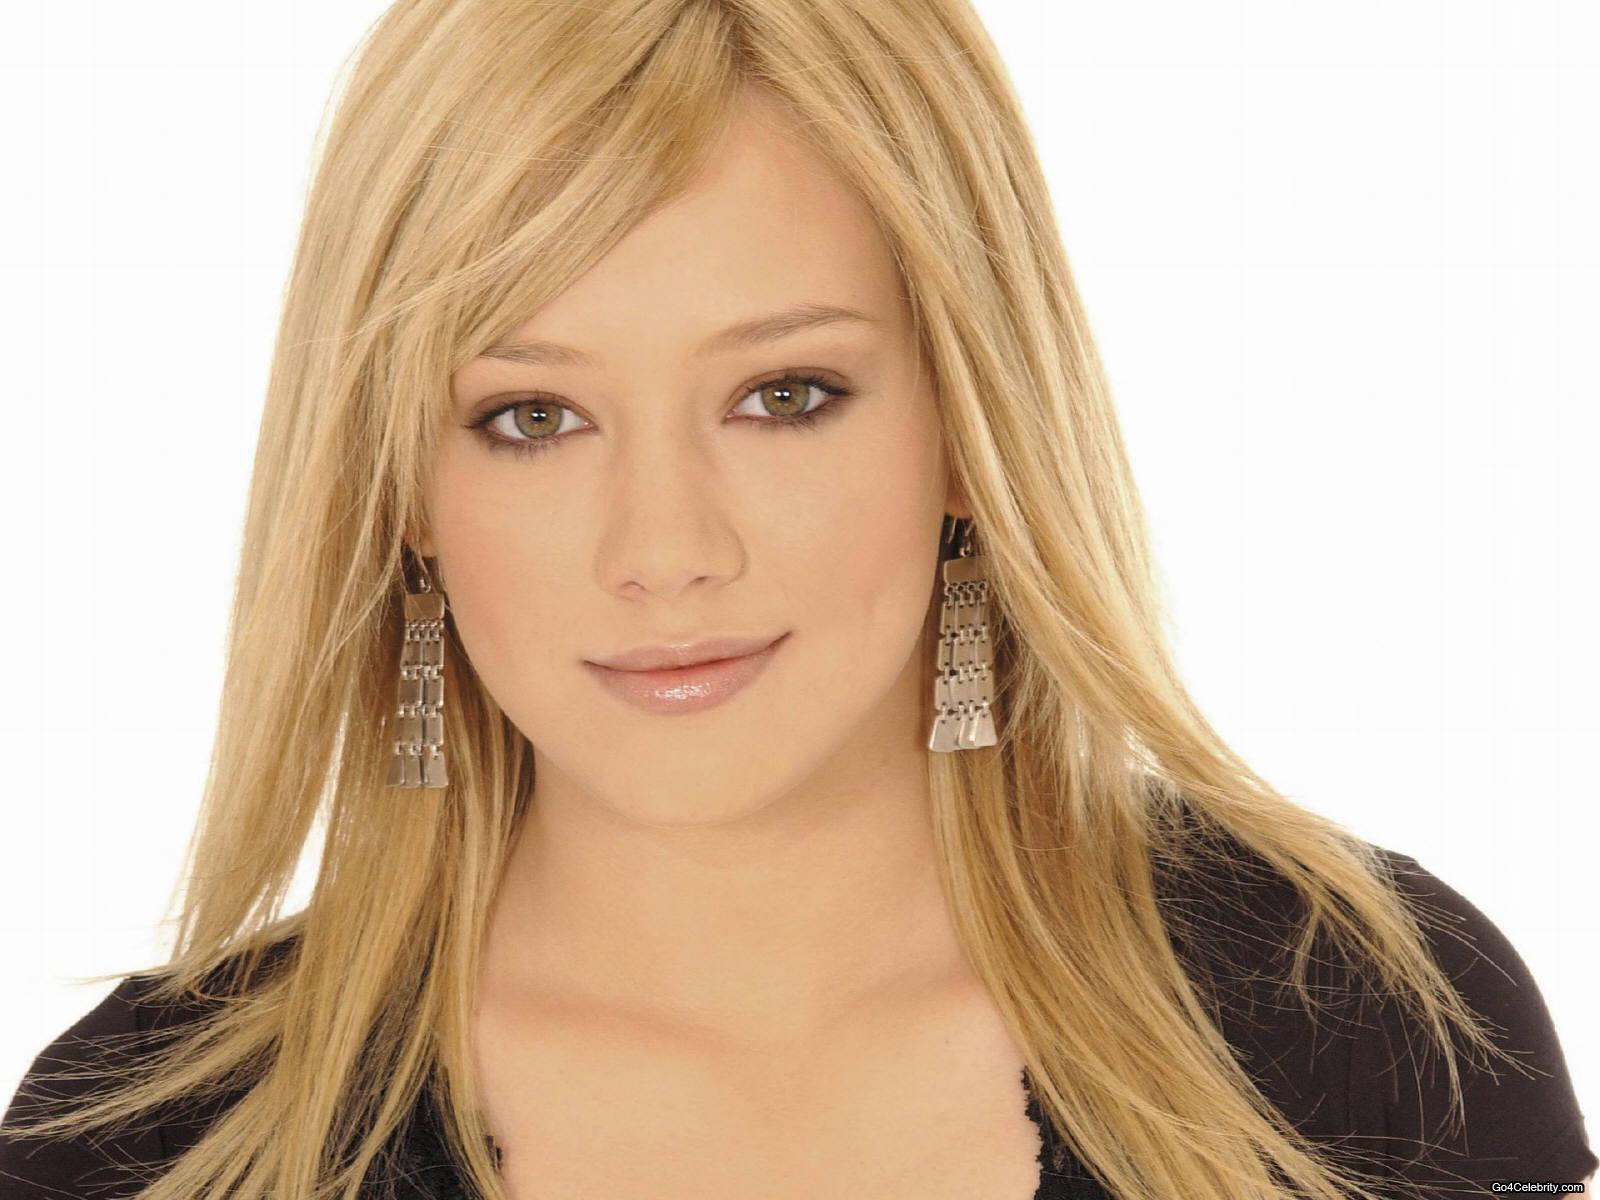 White Beauty Hilary Duff